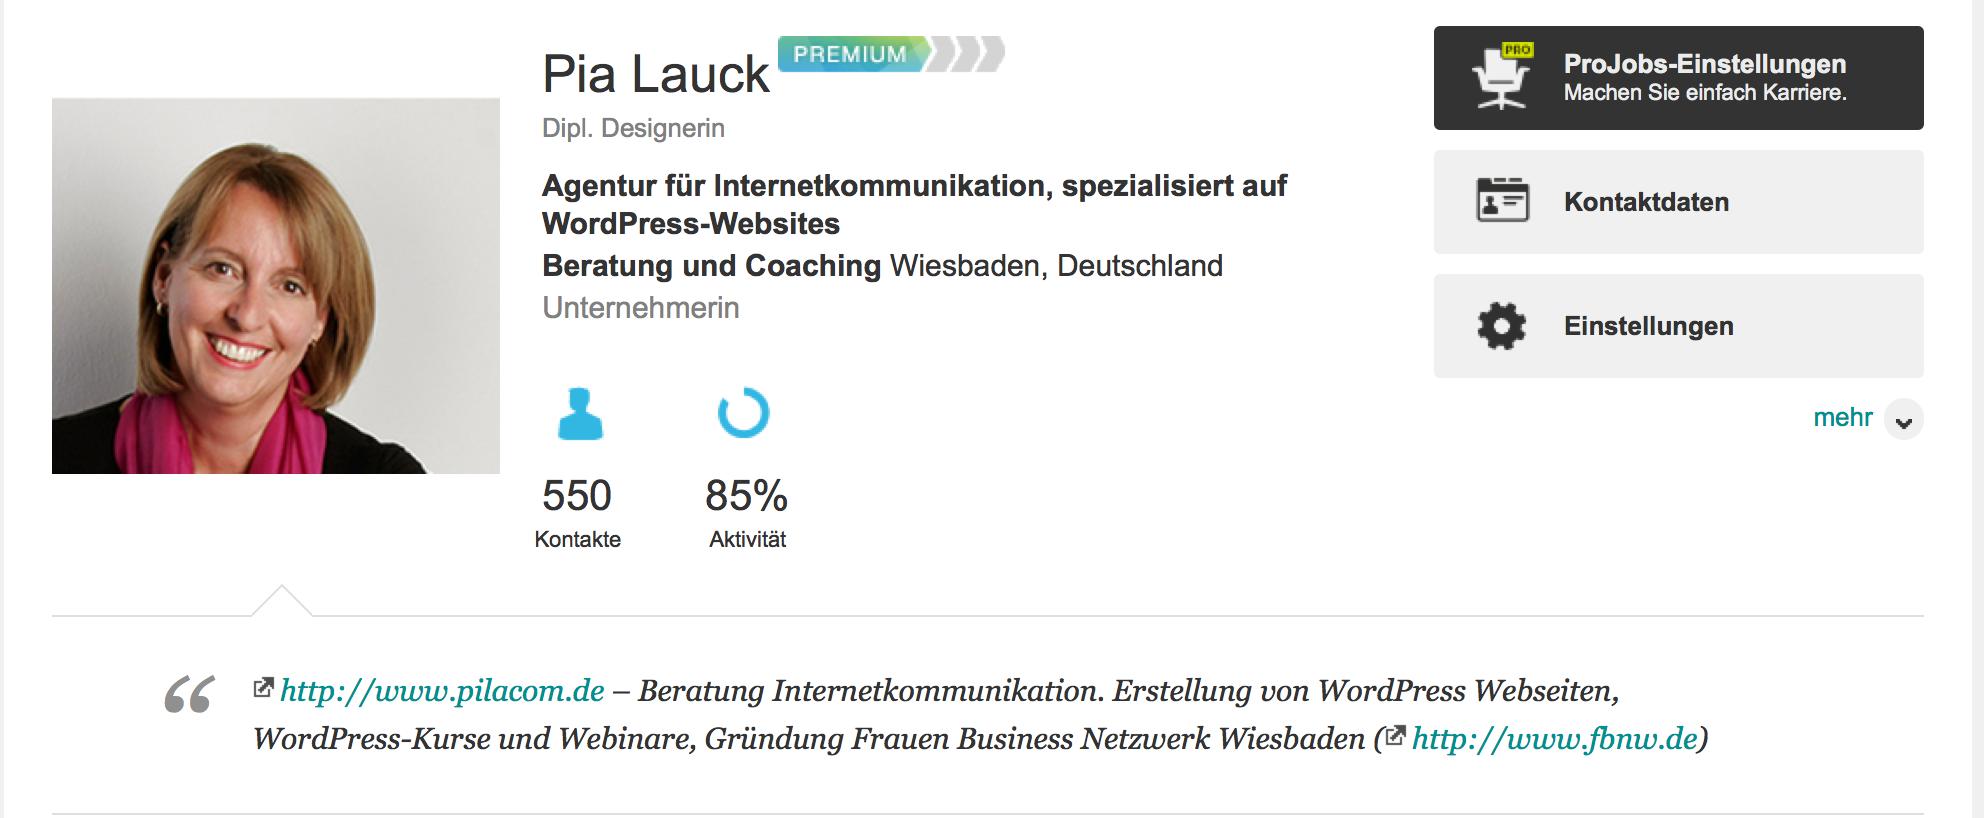 XING Profil Pia Lauck